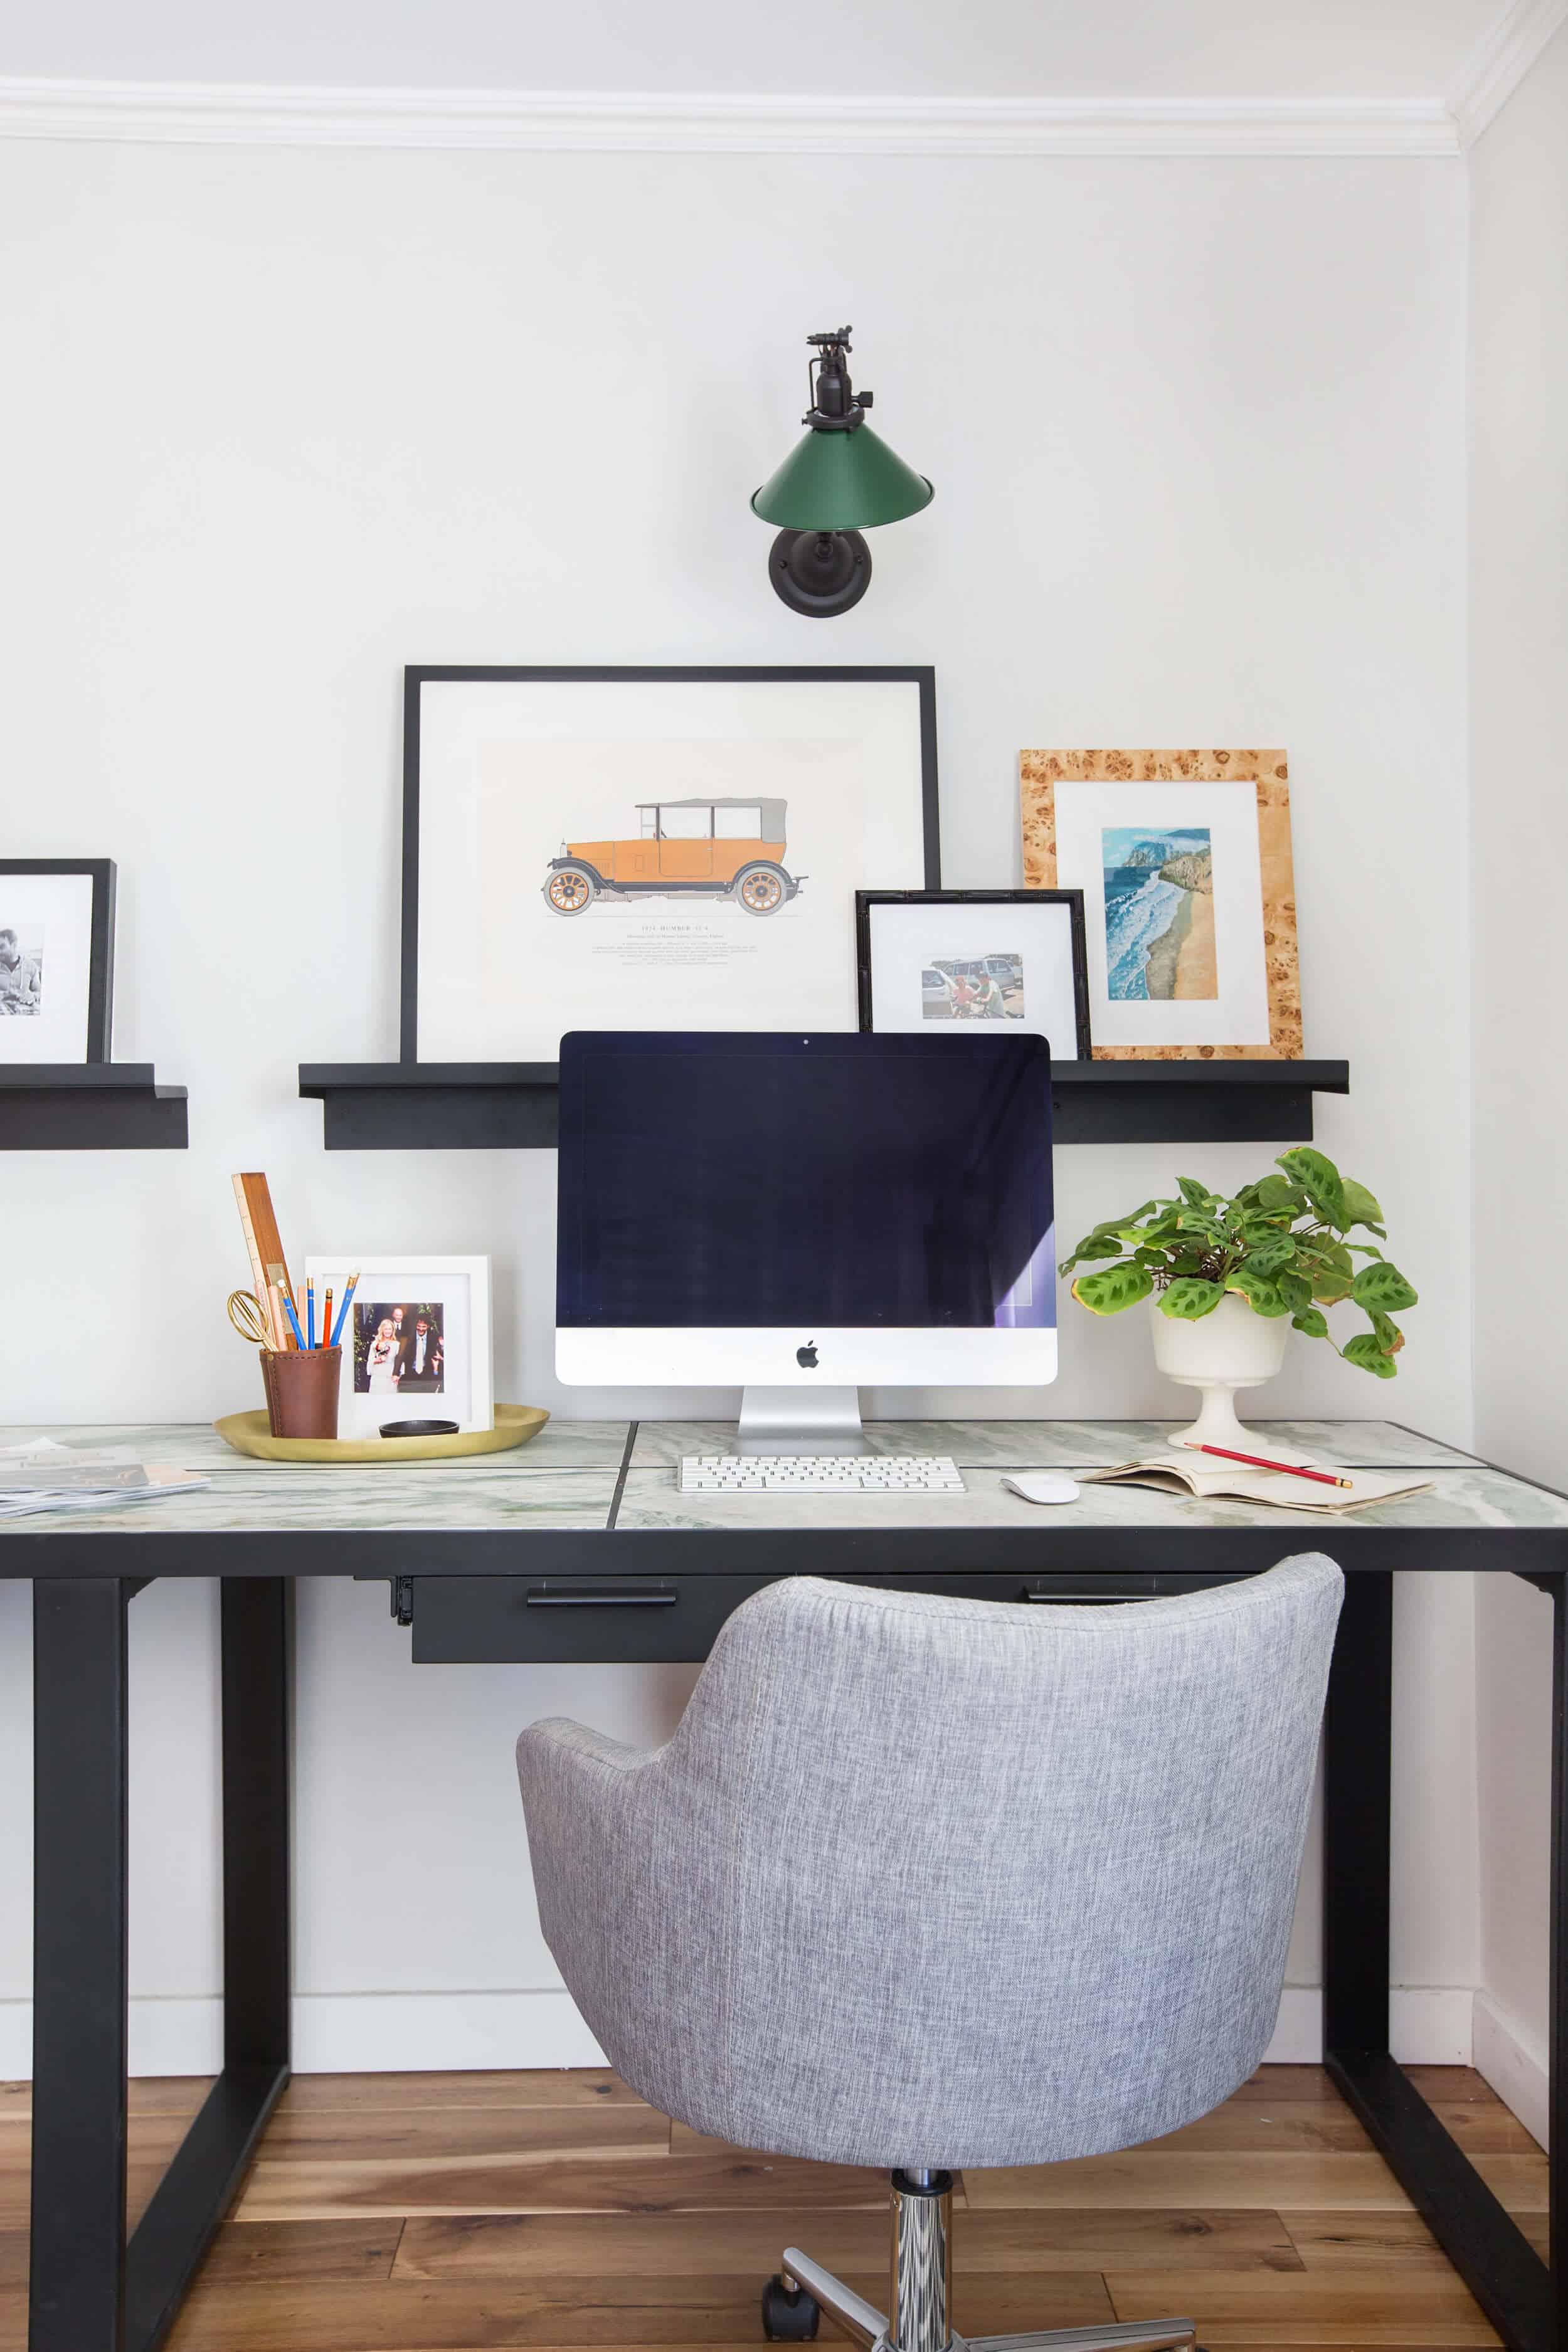 emily-henderson_framebridge_art-ledge_brians-office_masculine-office_guy_green_plaid-rug_workspace_modern_eclectic_7